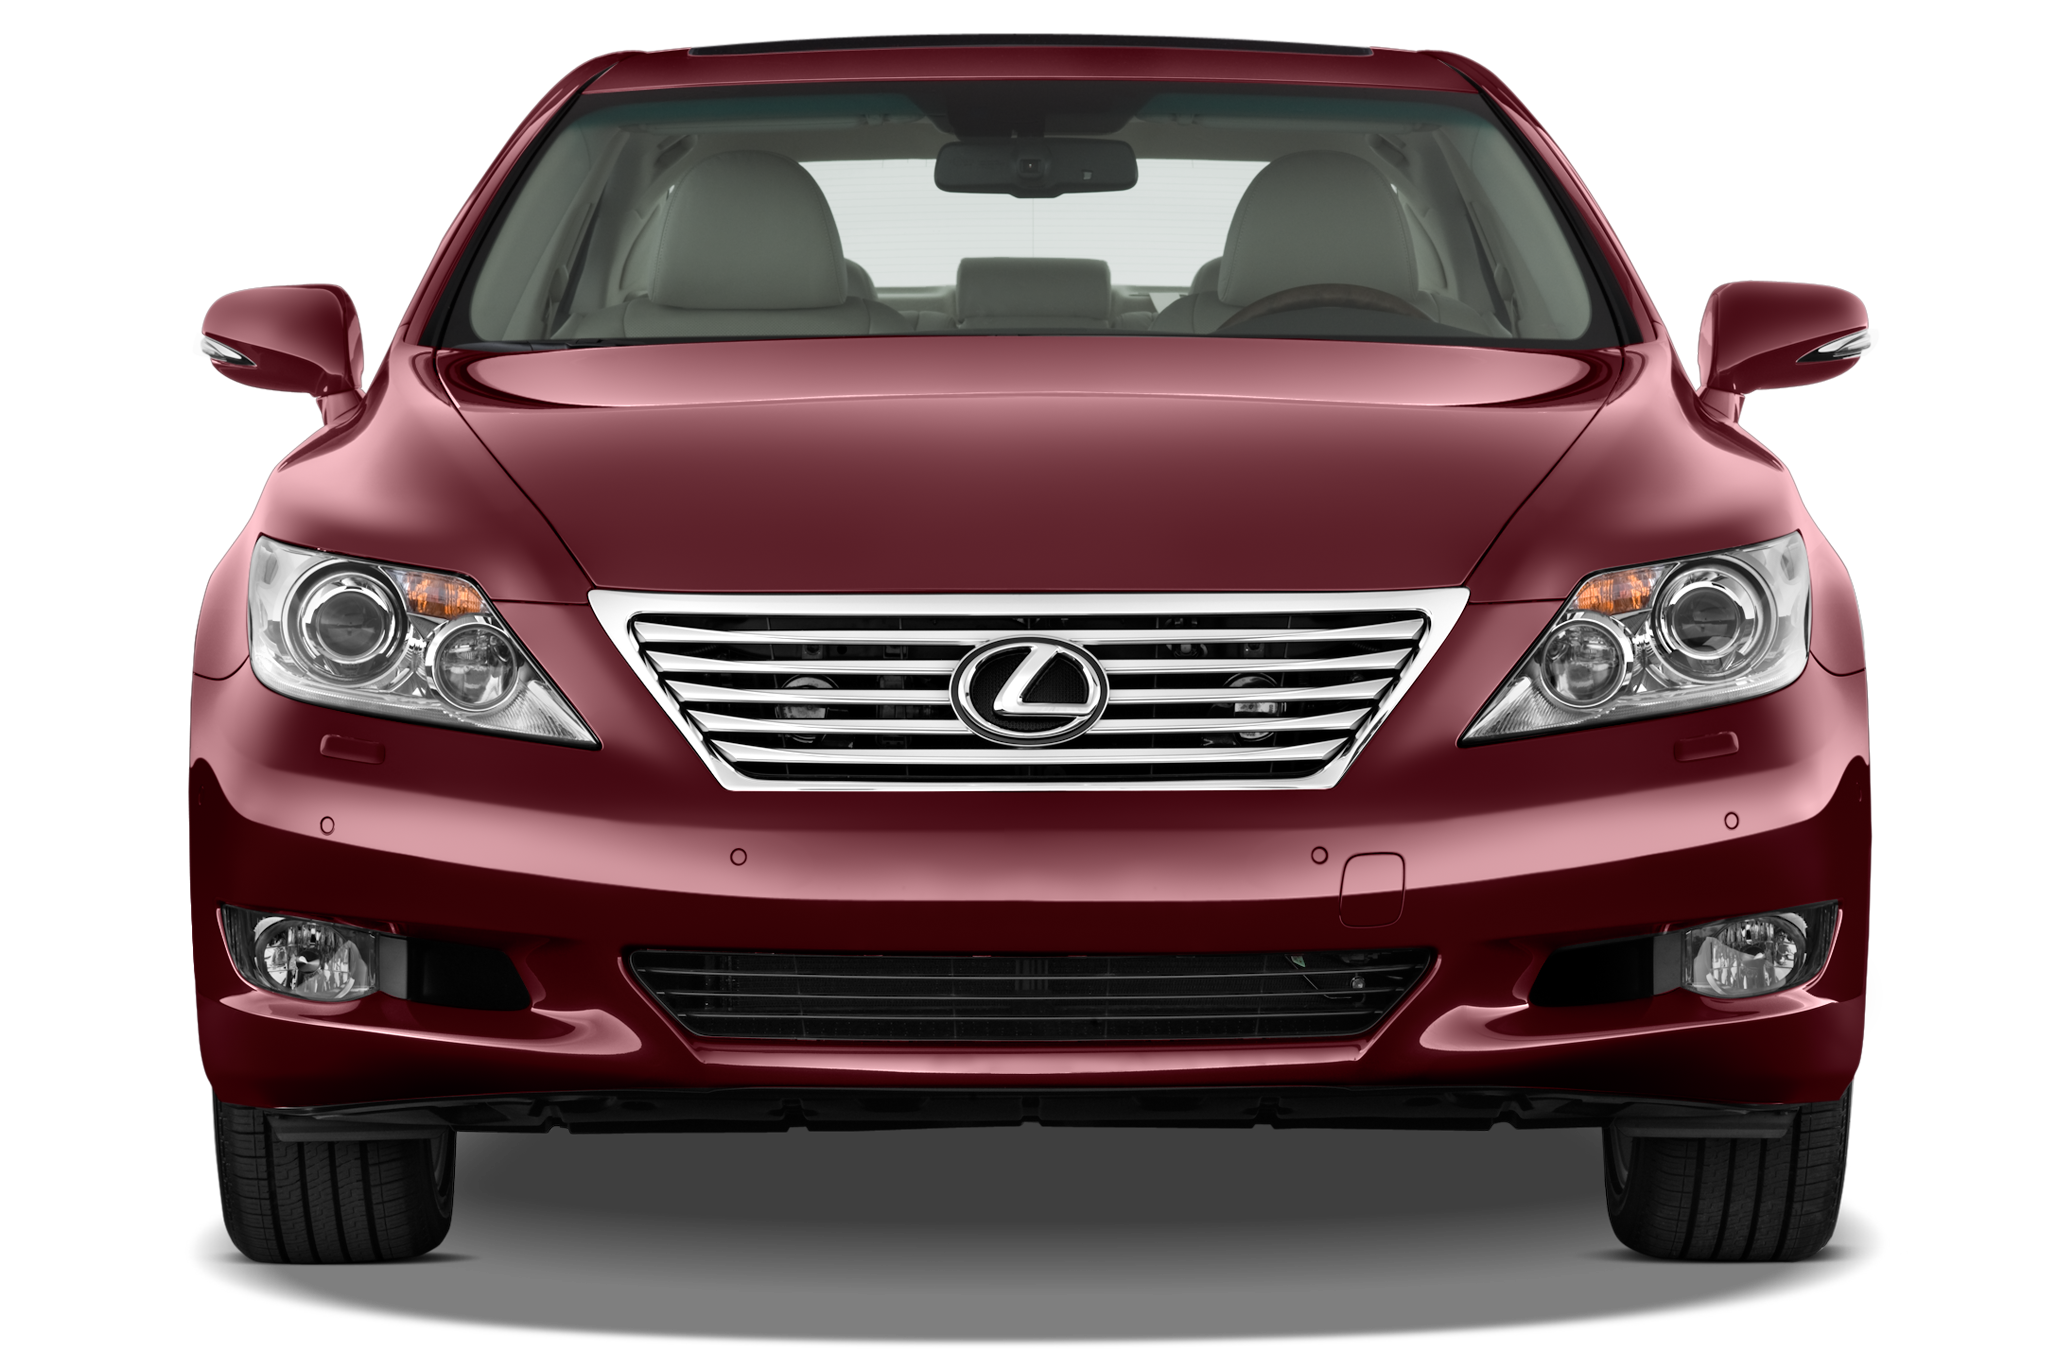 2010 lexus ls460l lexus luxury sedan review automobile magazine. Black Bedroom Furniture Sets. Home Design Ideas